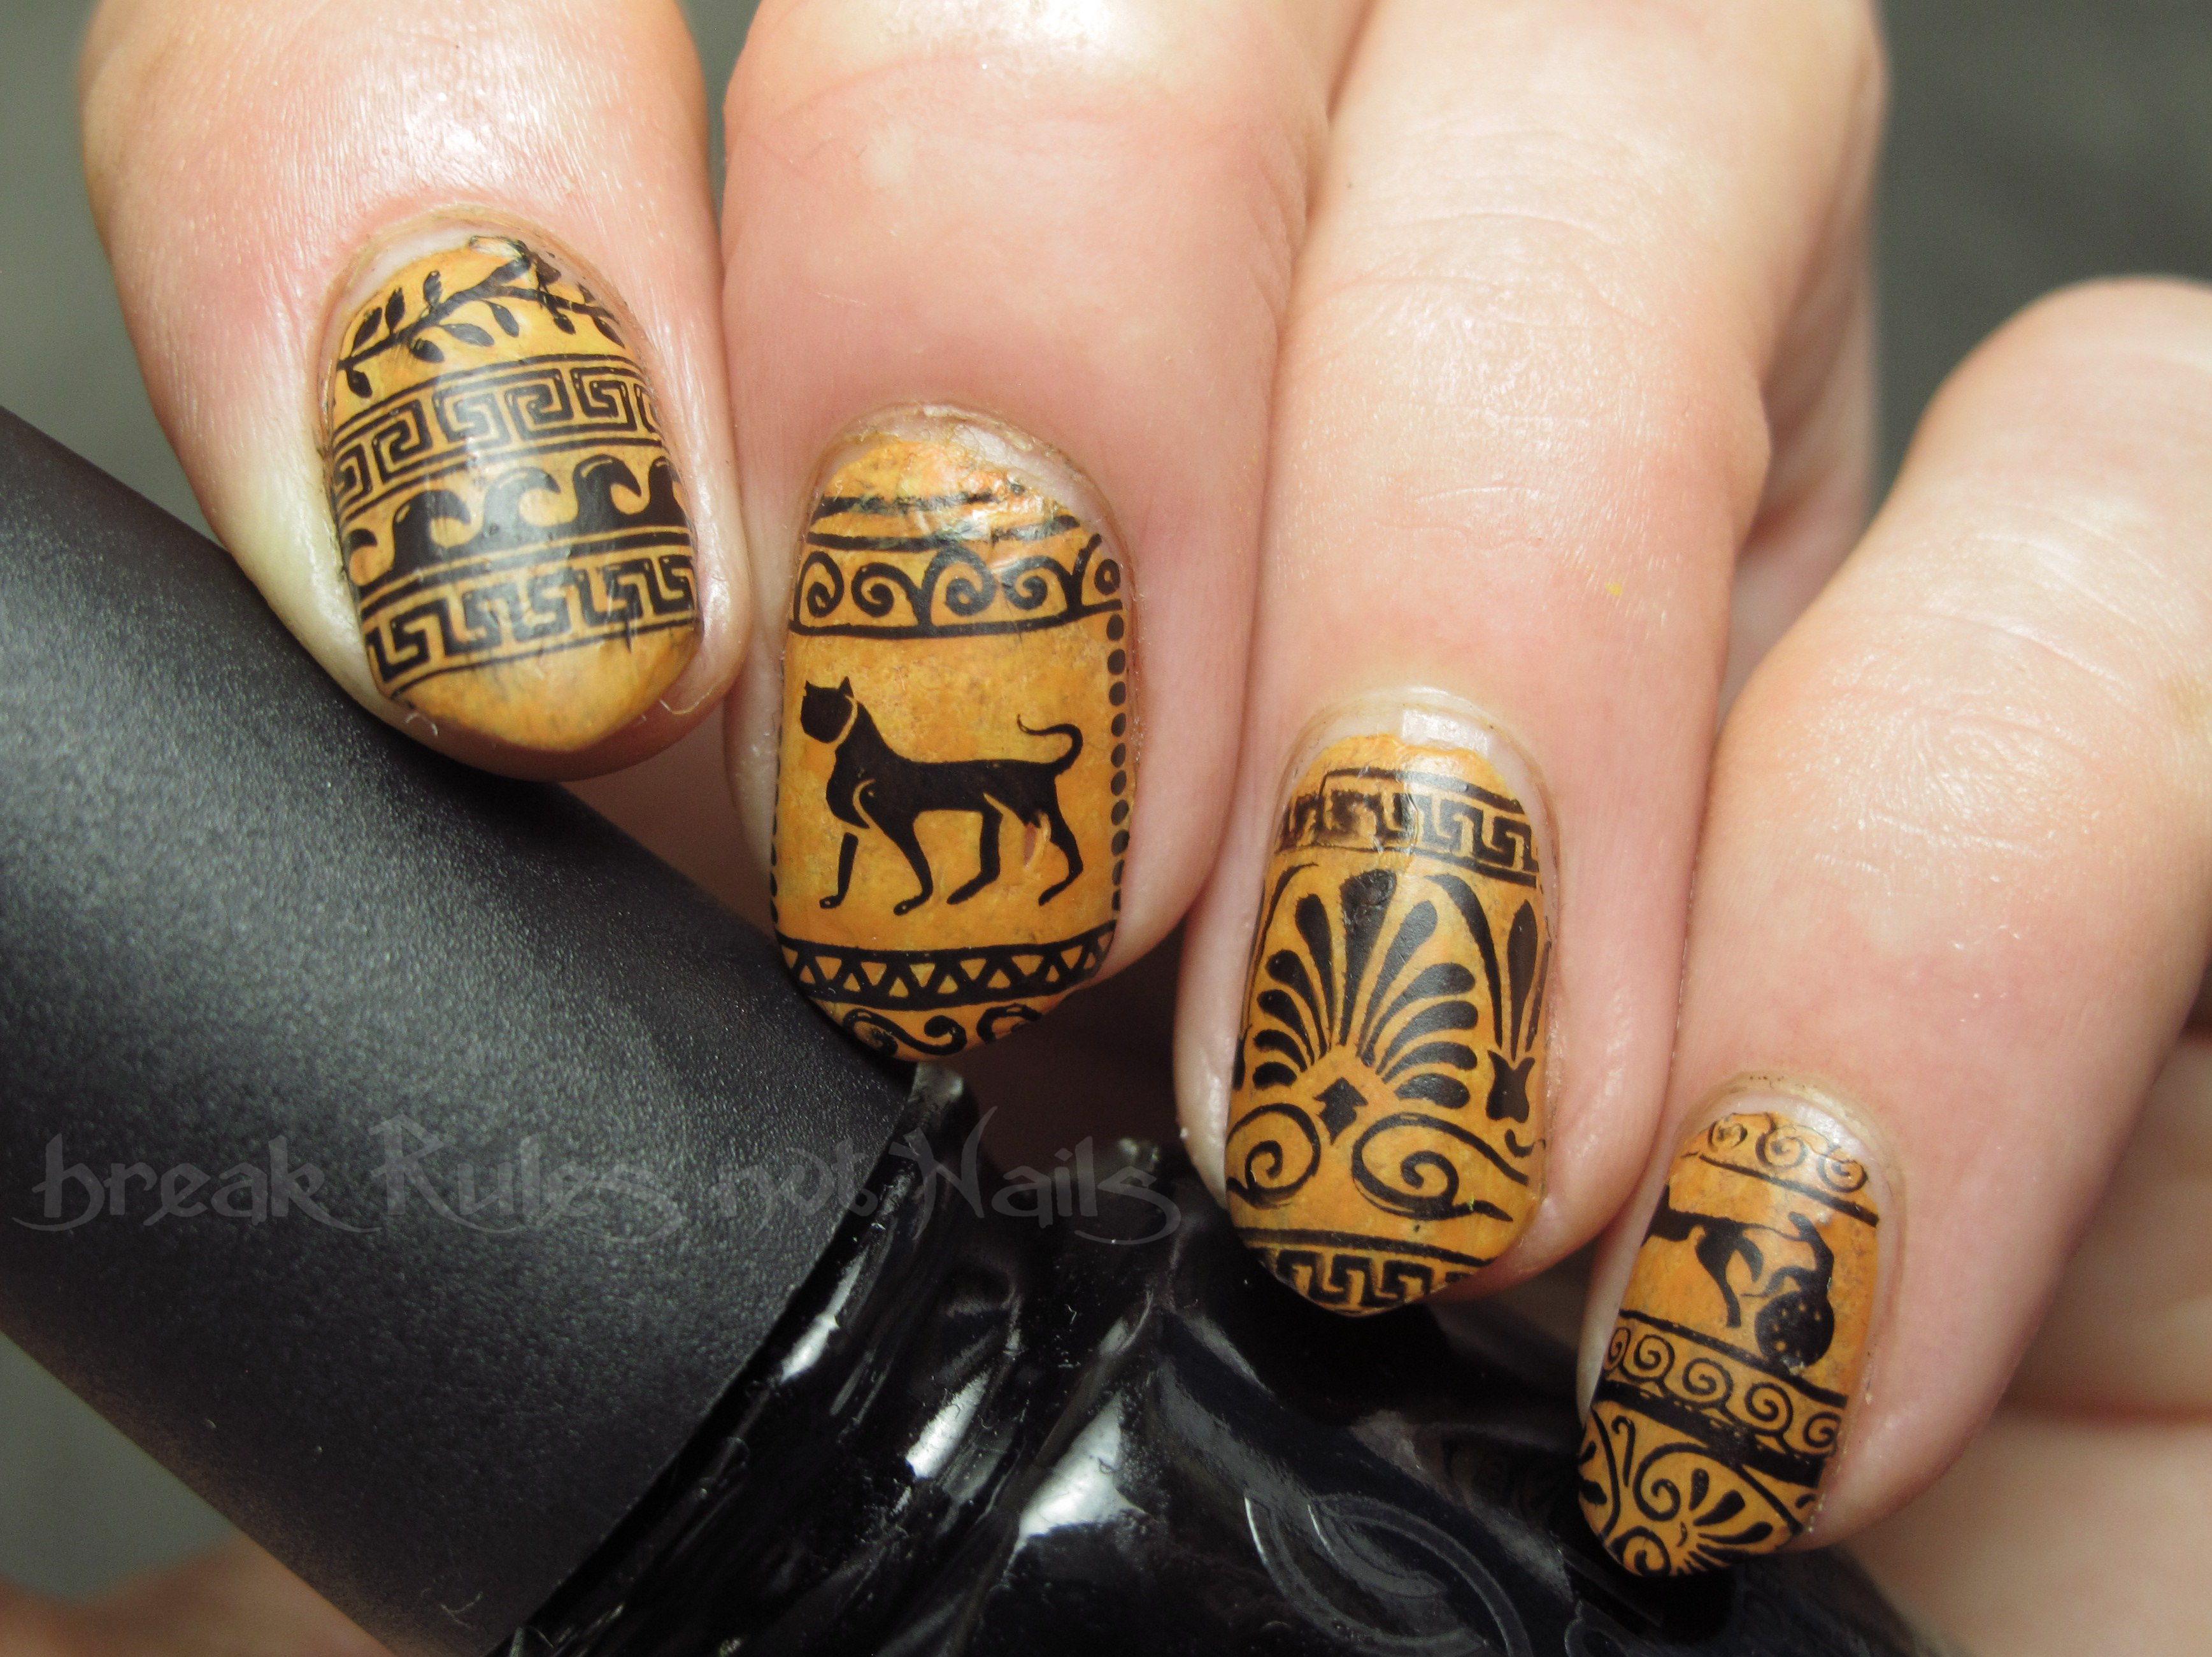 Fine Gel Vs Regular Nail Polish Huge Hello Kitty Toe Nail Art Rectangular Opi Nail Polishes Summertime Nail Art Old Tribal Nails Art BrightToxic Nail Polish Brands Moyou London Nail Art | Break Rules, Not Nails